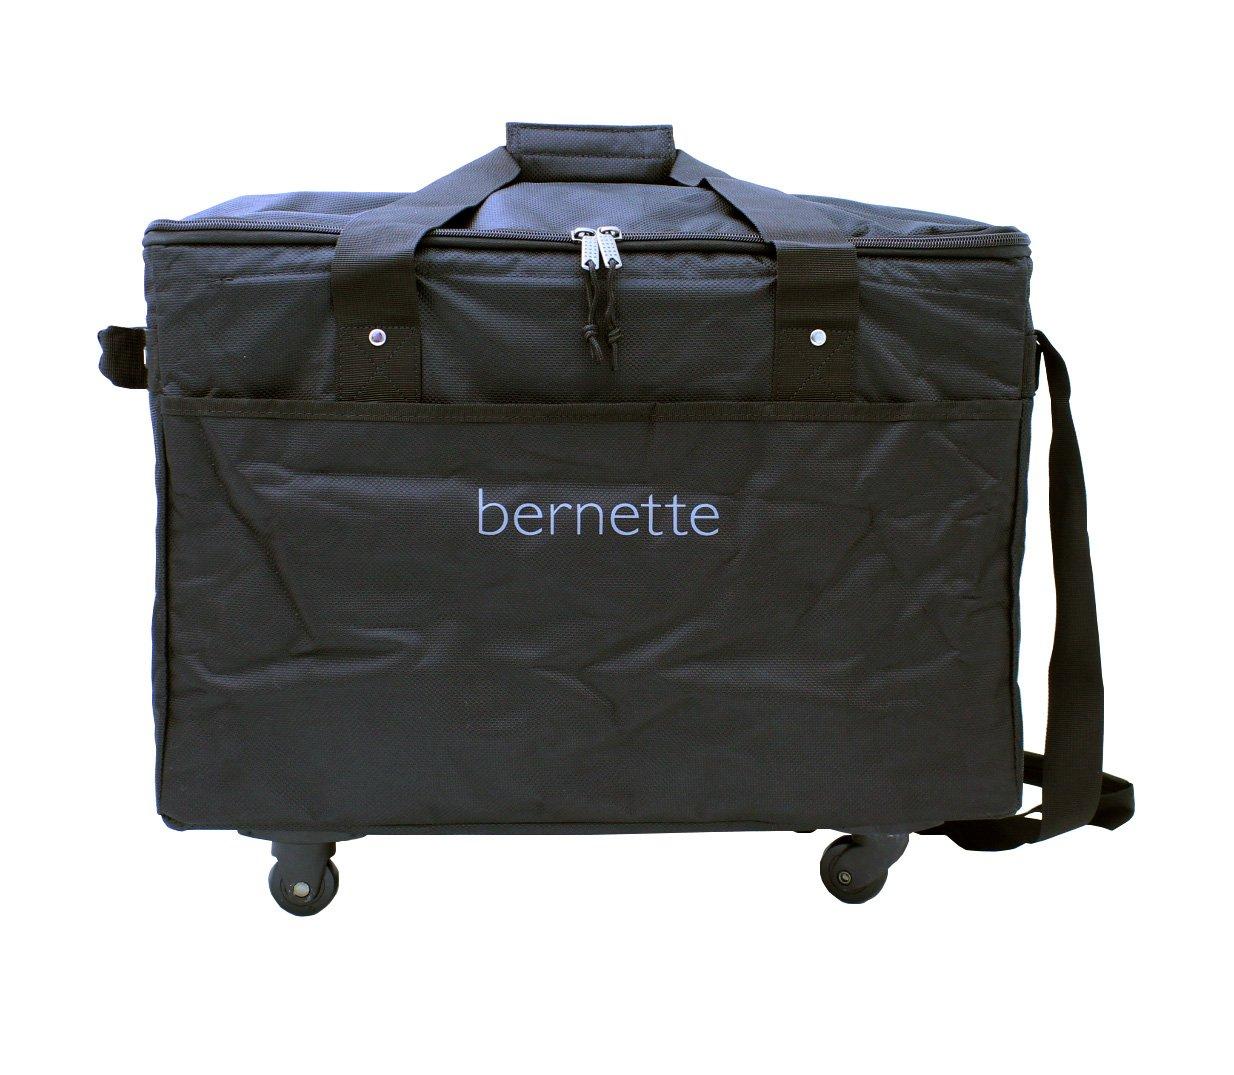 Bernette Rolling Sewing Machine Trolley